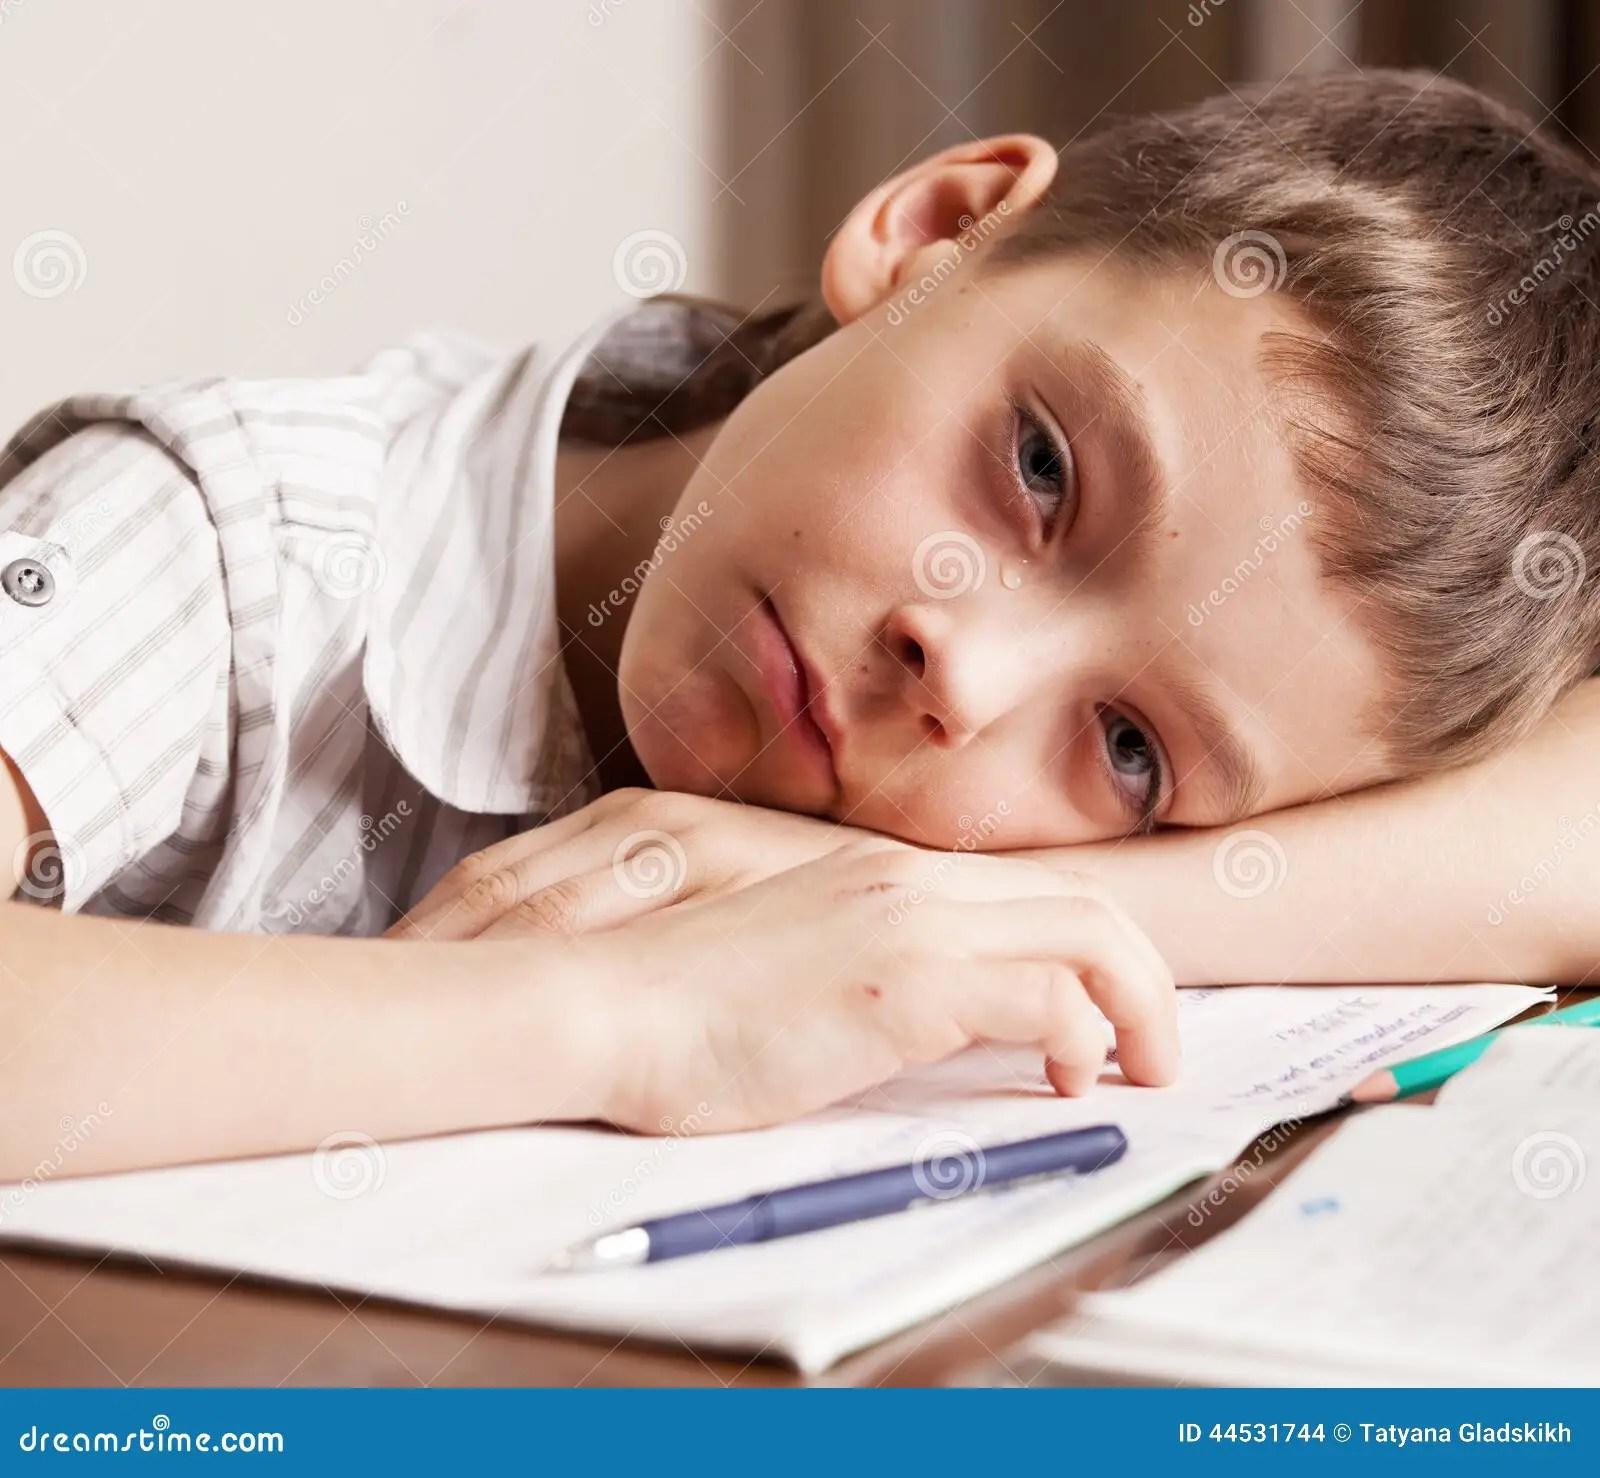 Girl Crying Doing Homework